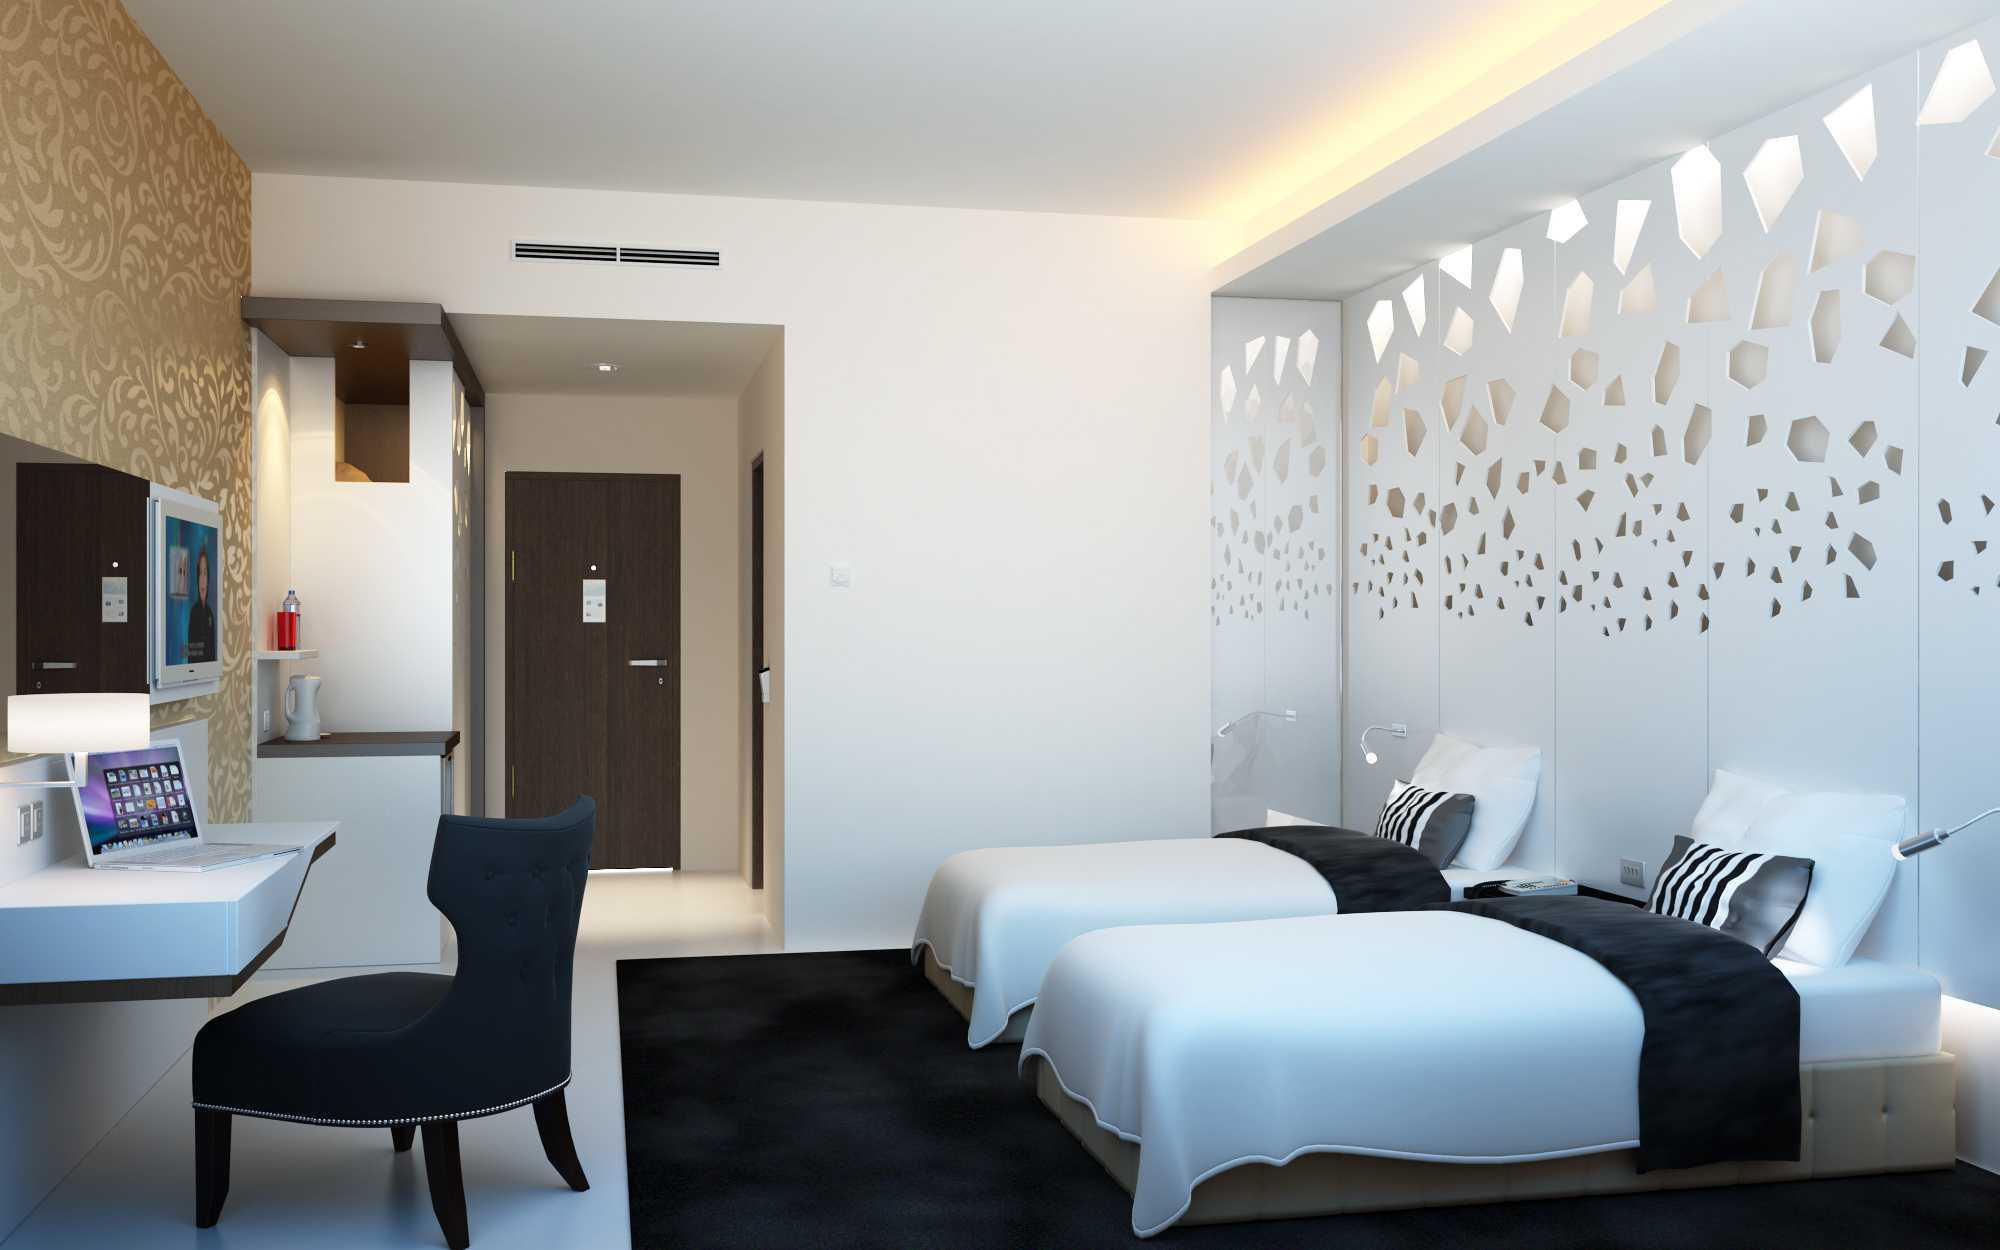 Andrey Yunas Penamas Hotel Renovasi Makasar Makasar Hotel Room   14851